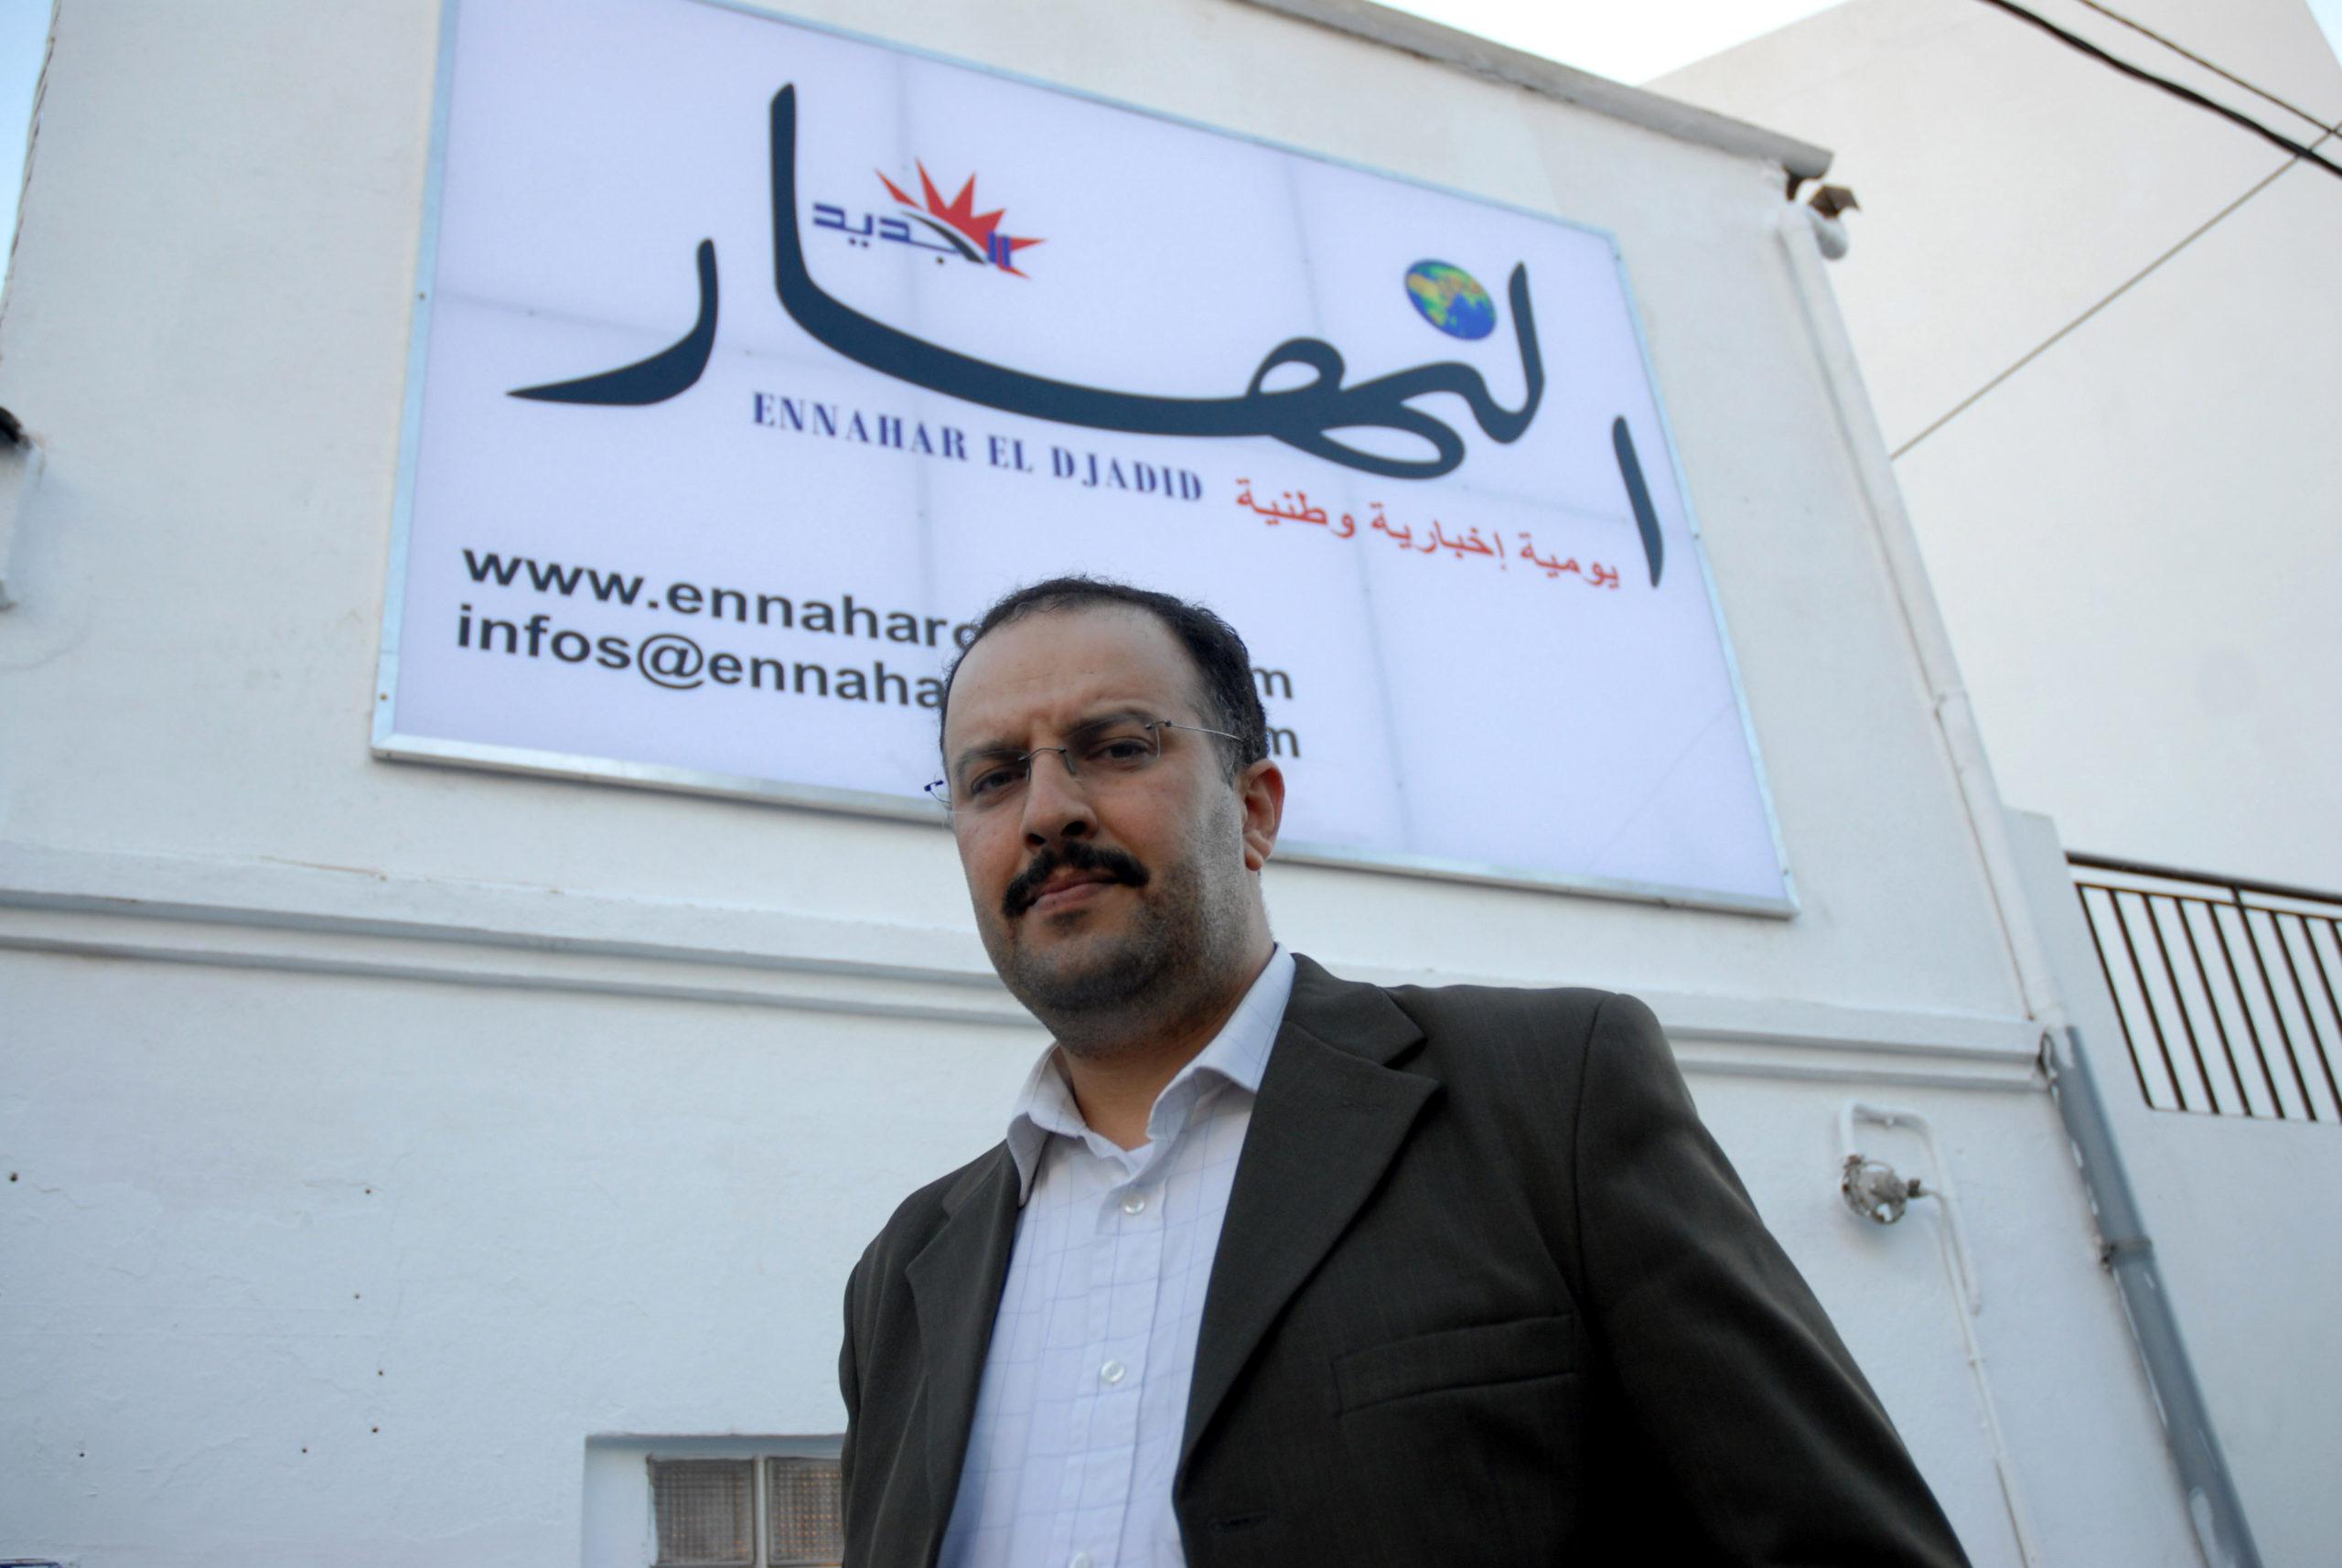 Le directeur d'Ennahar Anis Rahmani à Alger en 2007 | Photo: Samir Sid.